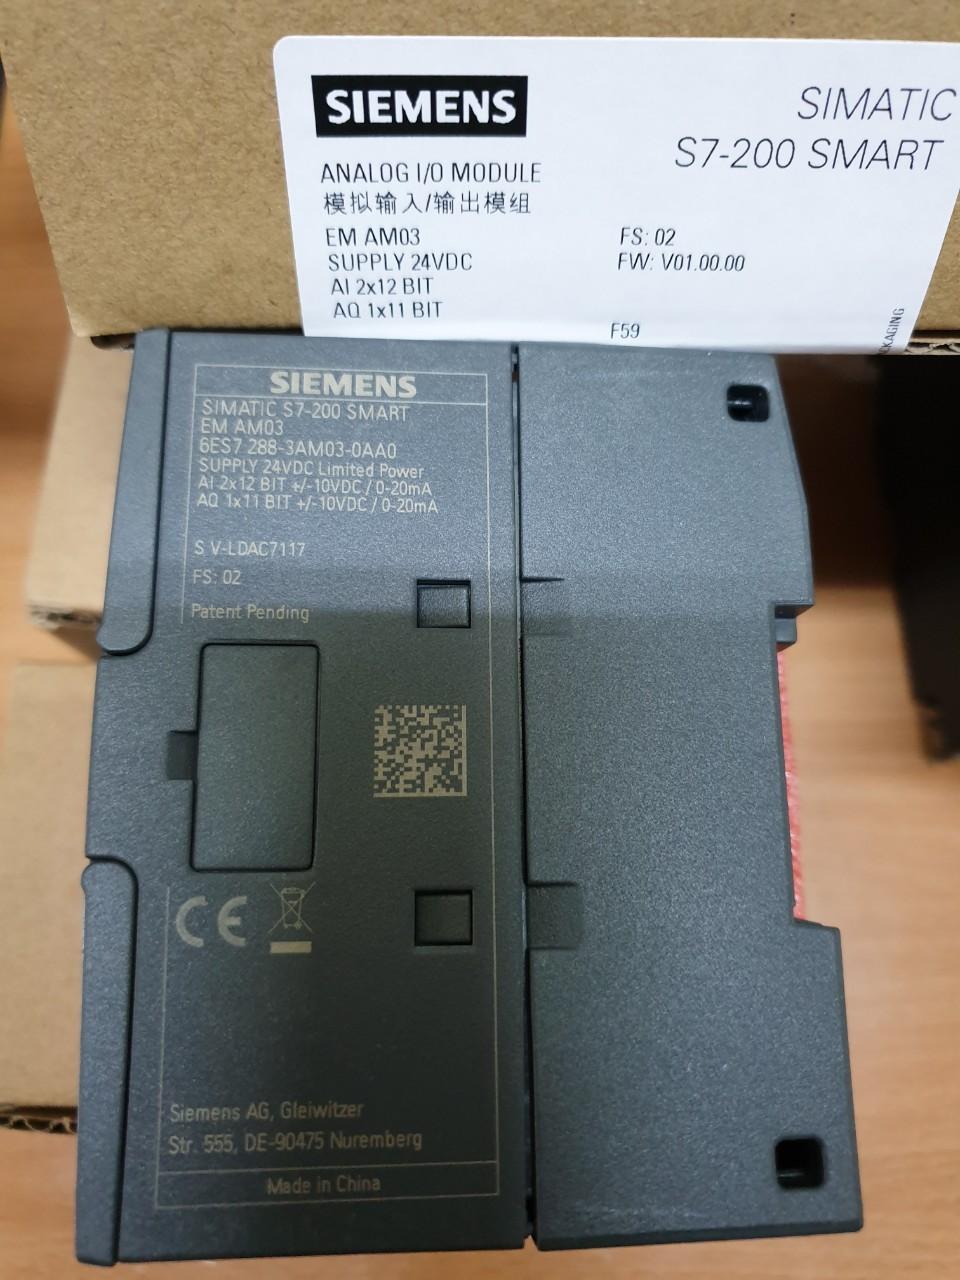 S7-200 Smart EM AM03 6ES7288-3AM03-0AA0